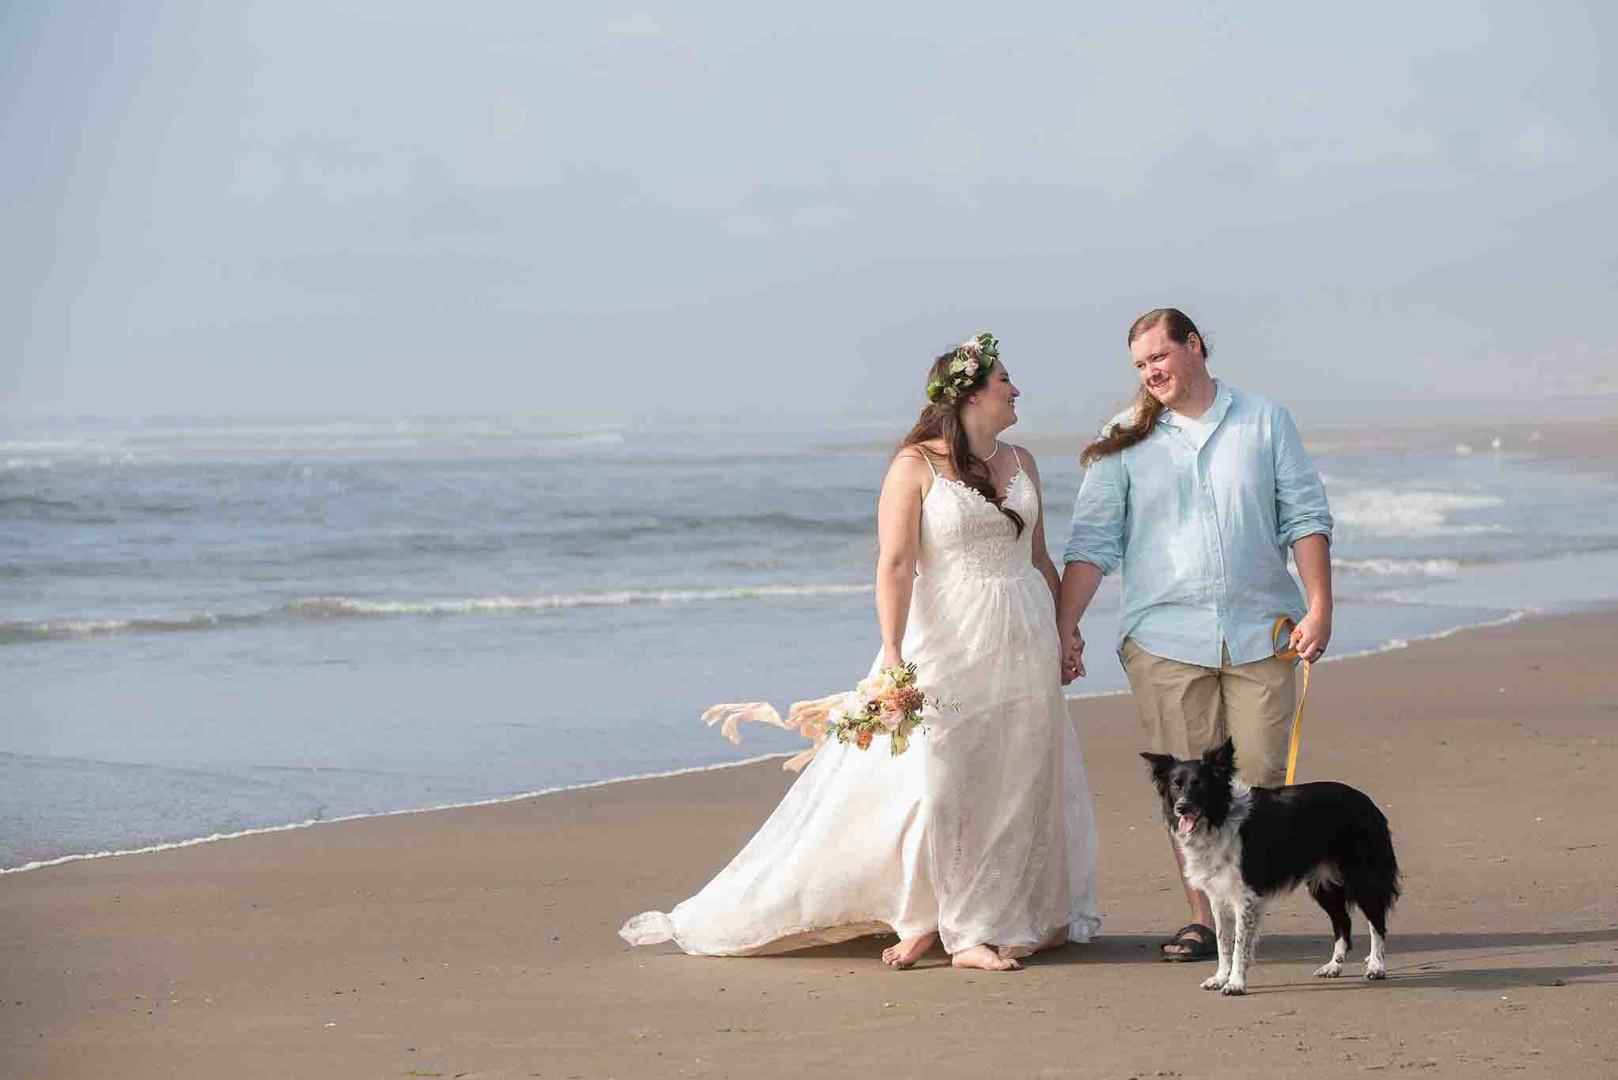 32-pacific-city-beach-wedding-photograph